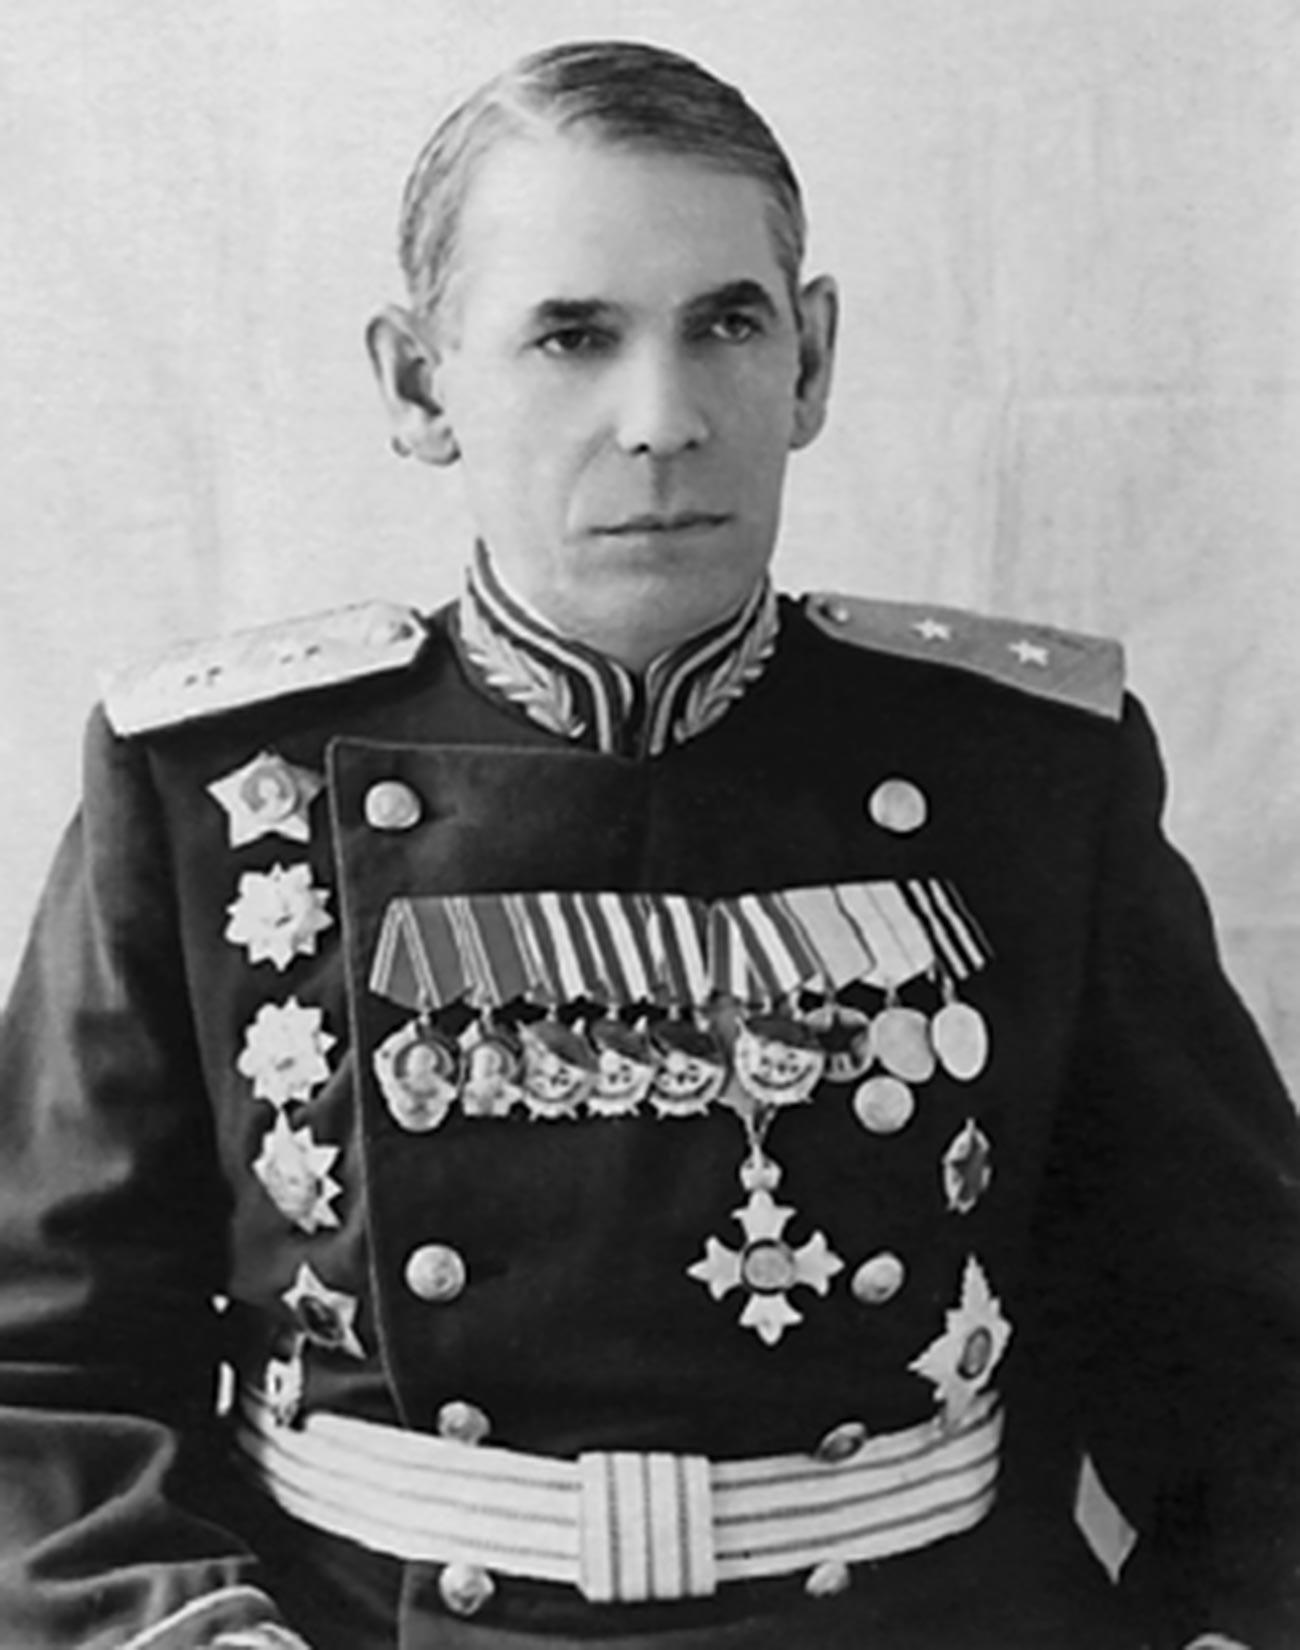 Nikolaï Gagen